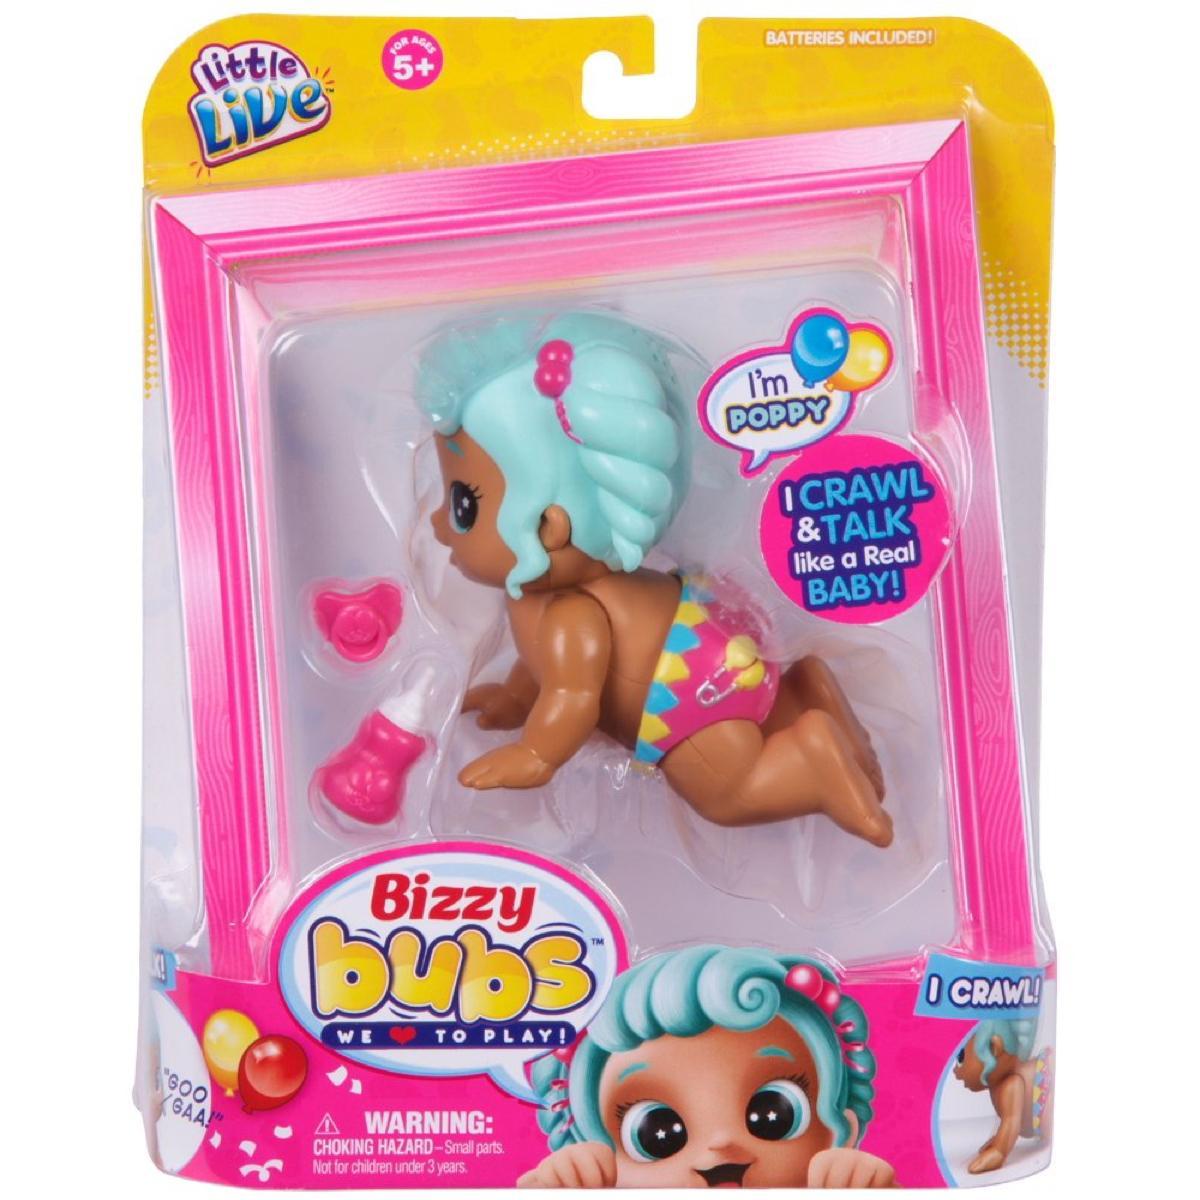 Little Live Bizzy Bubs Poppy